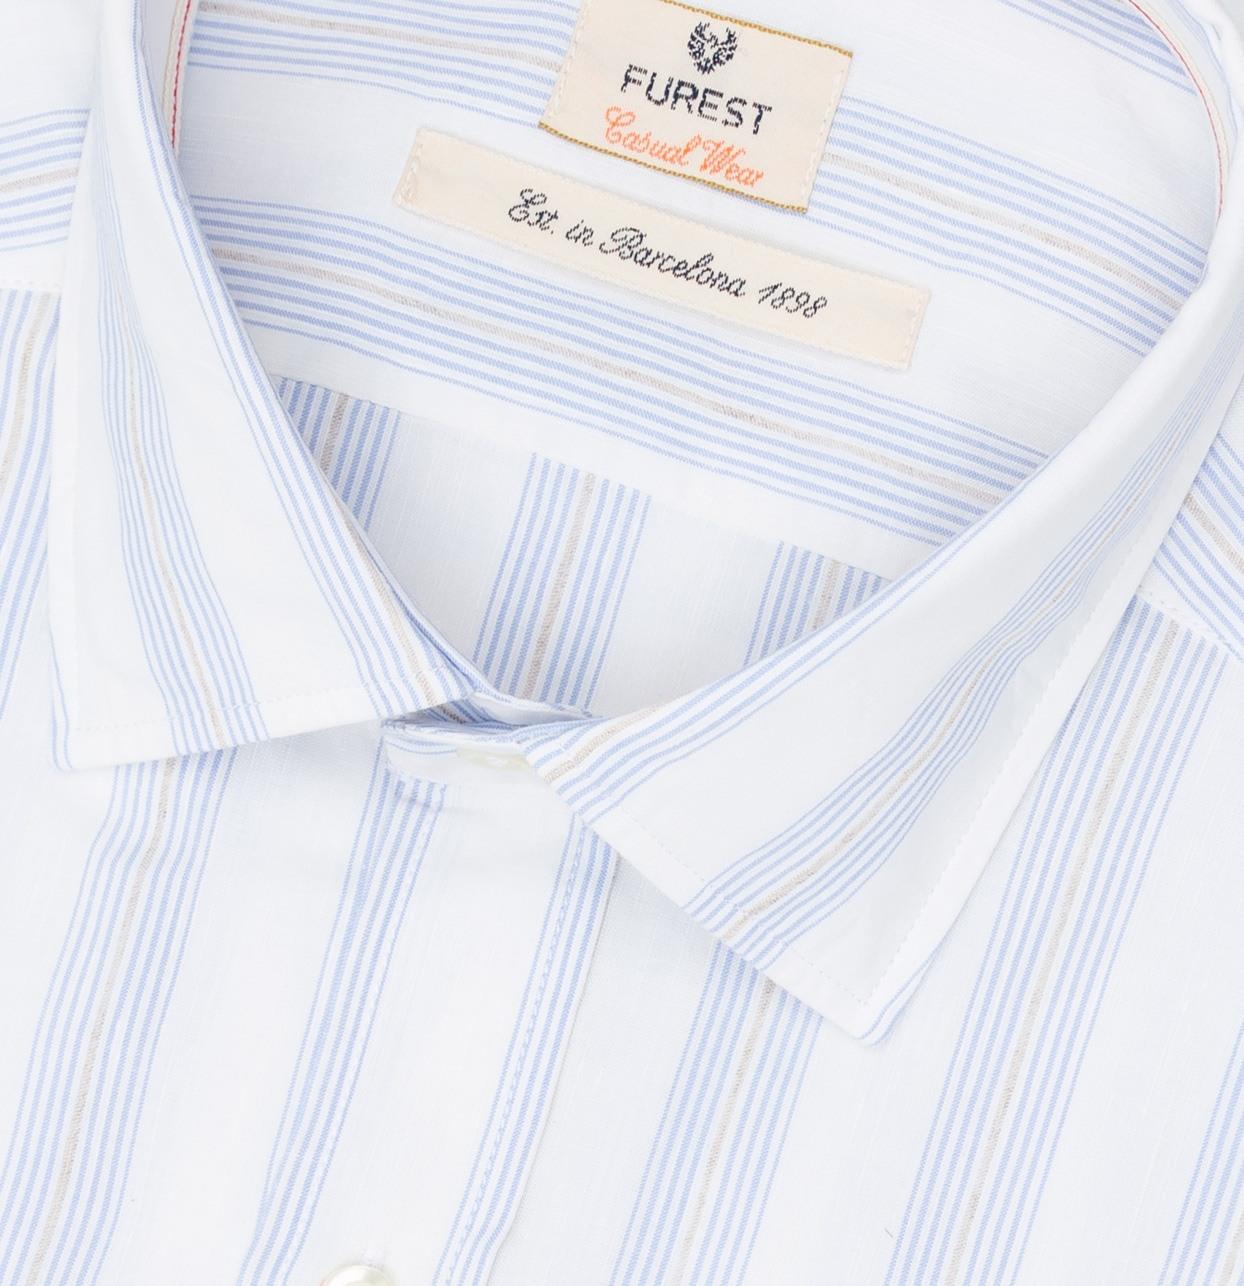 Camisa Casual Wear SLIM FIT modelo PORTO fondo blanco rayas azules, 100% Algodón. - Ítem1